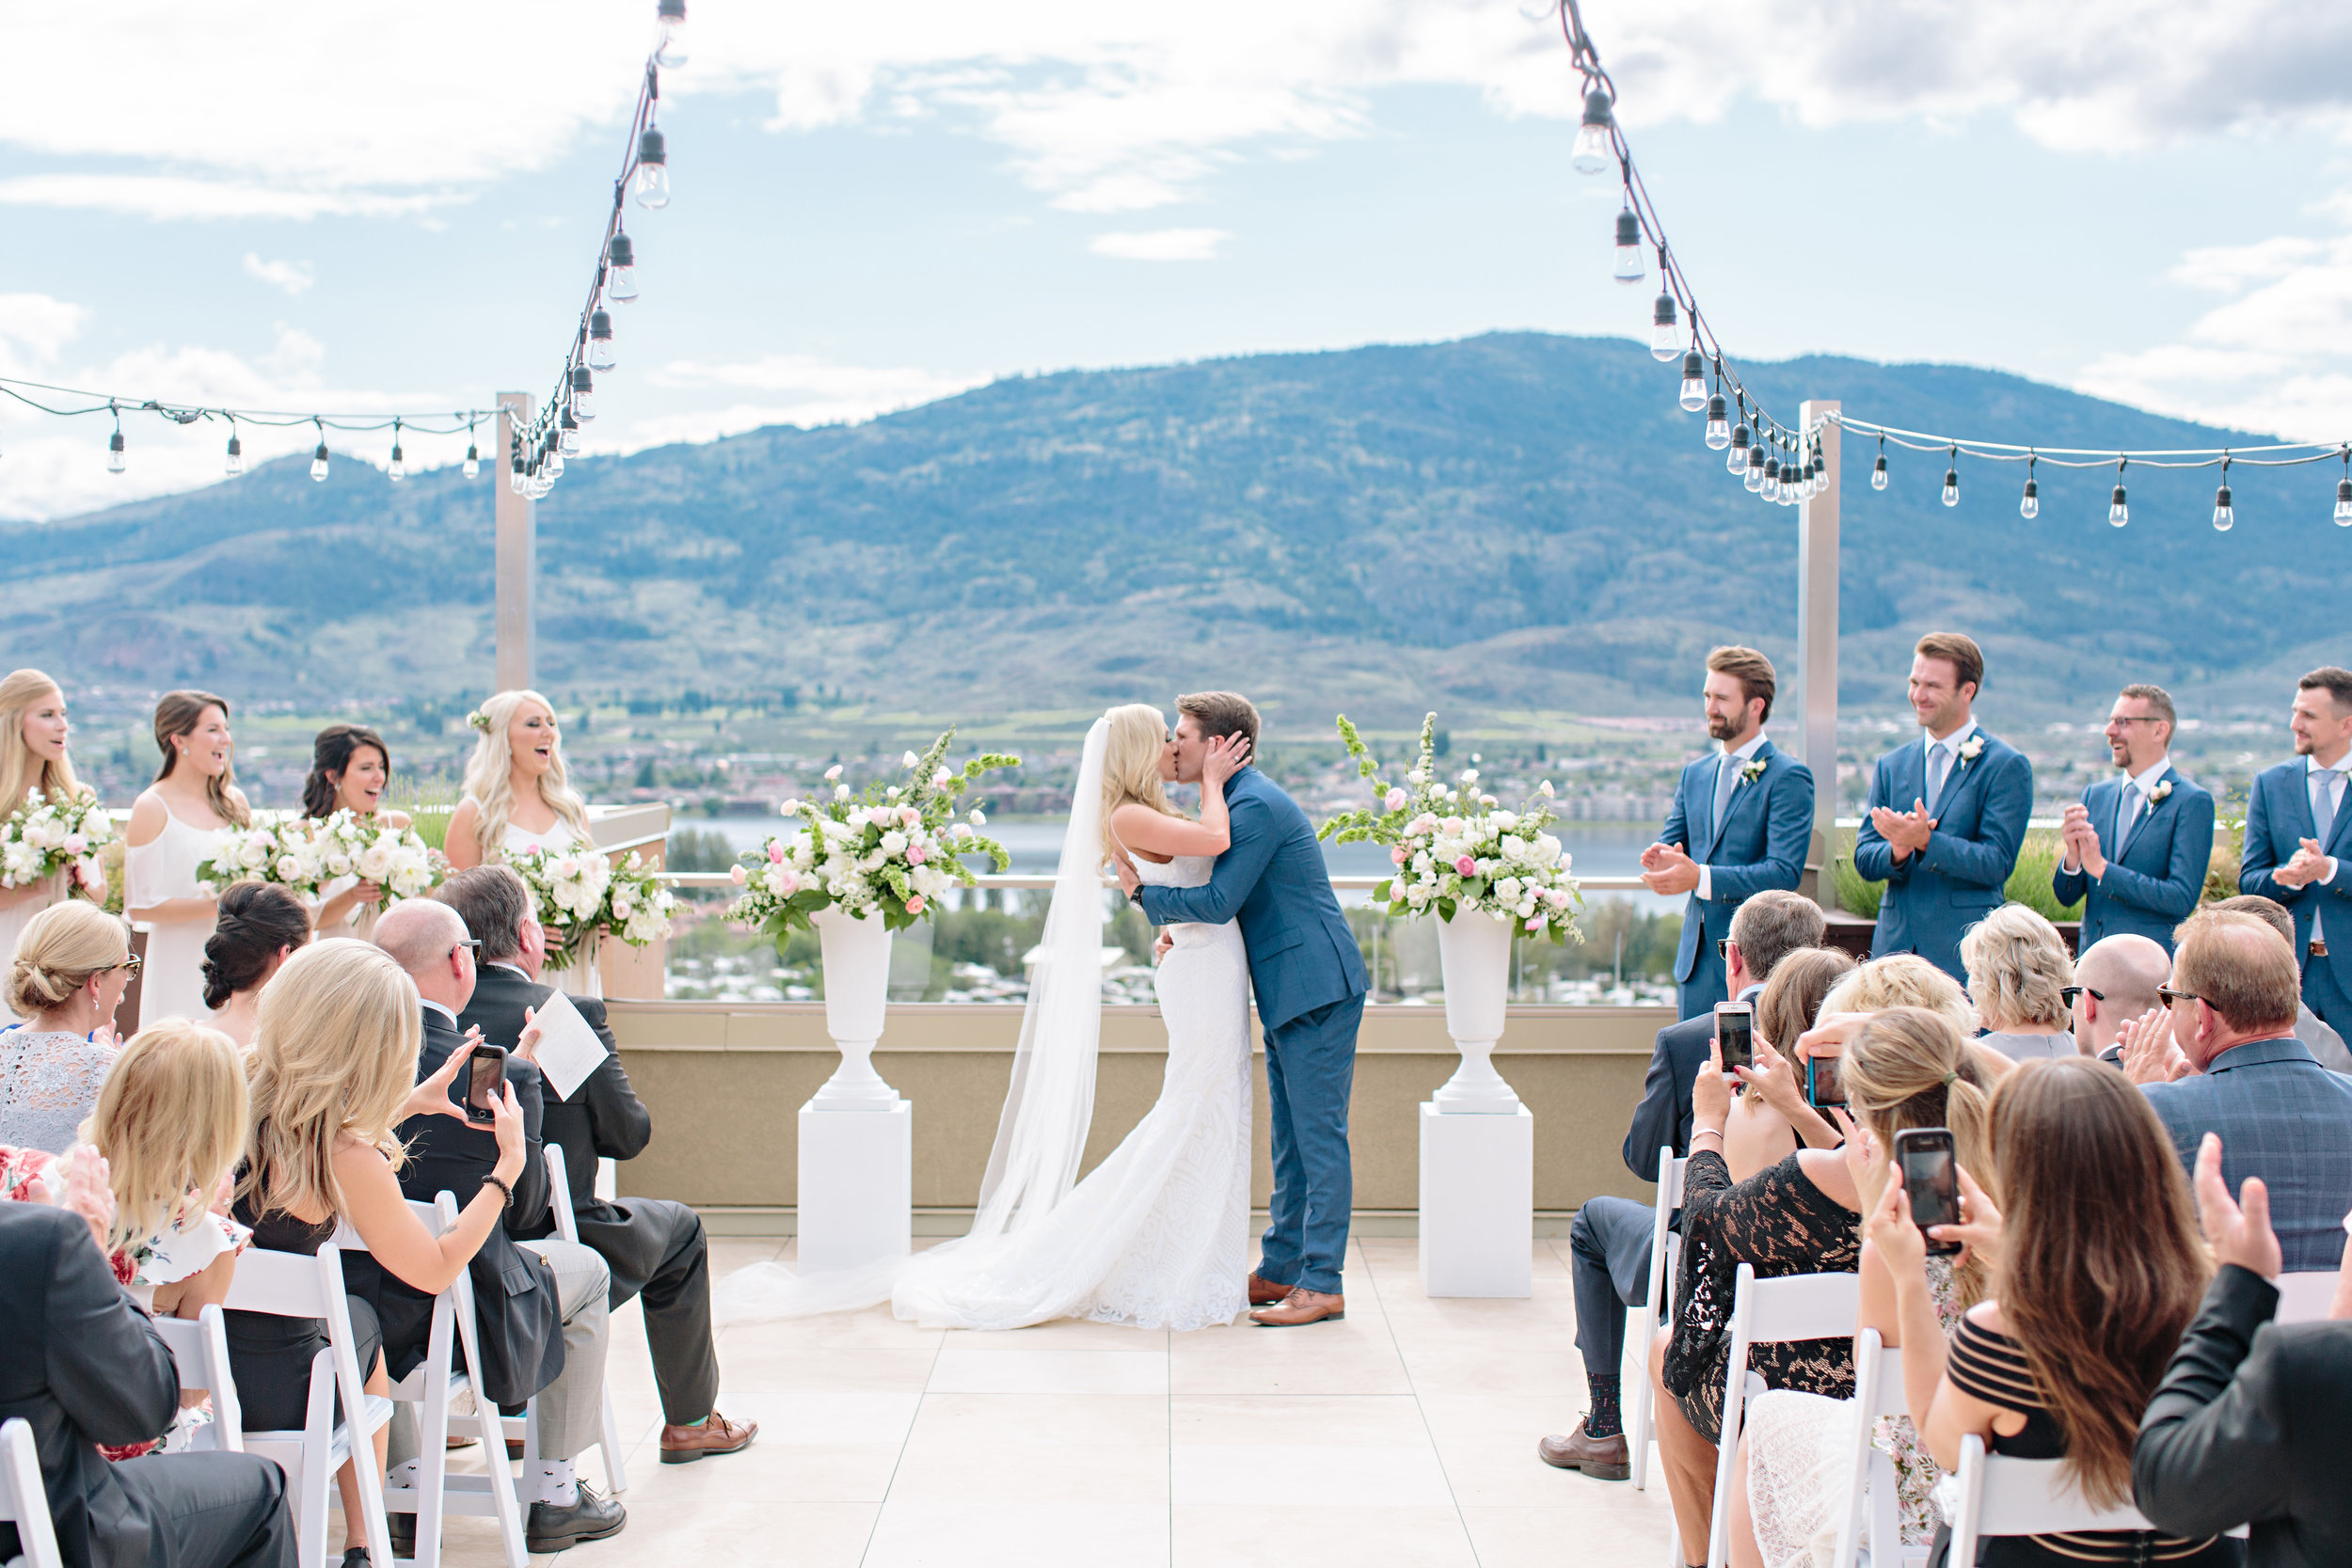 okanagan osoyoos summer wedding ceremony recessional just married i do.jpg